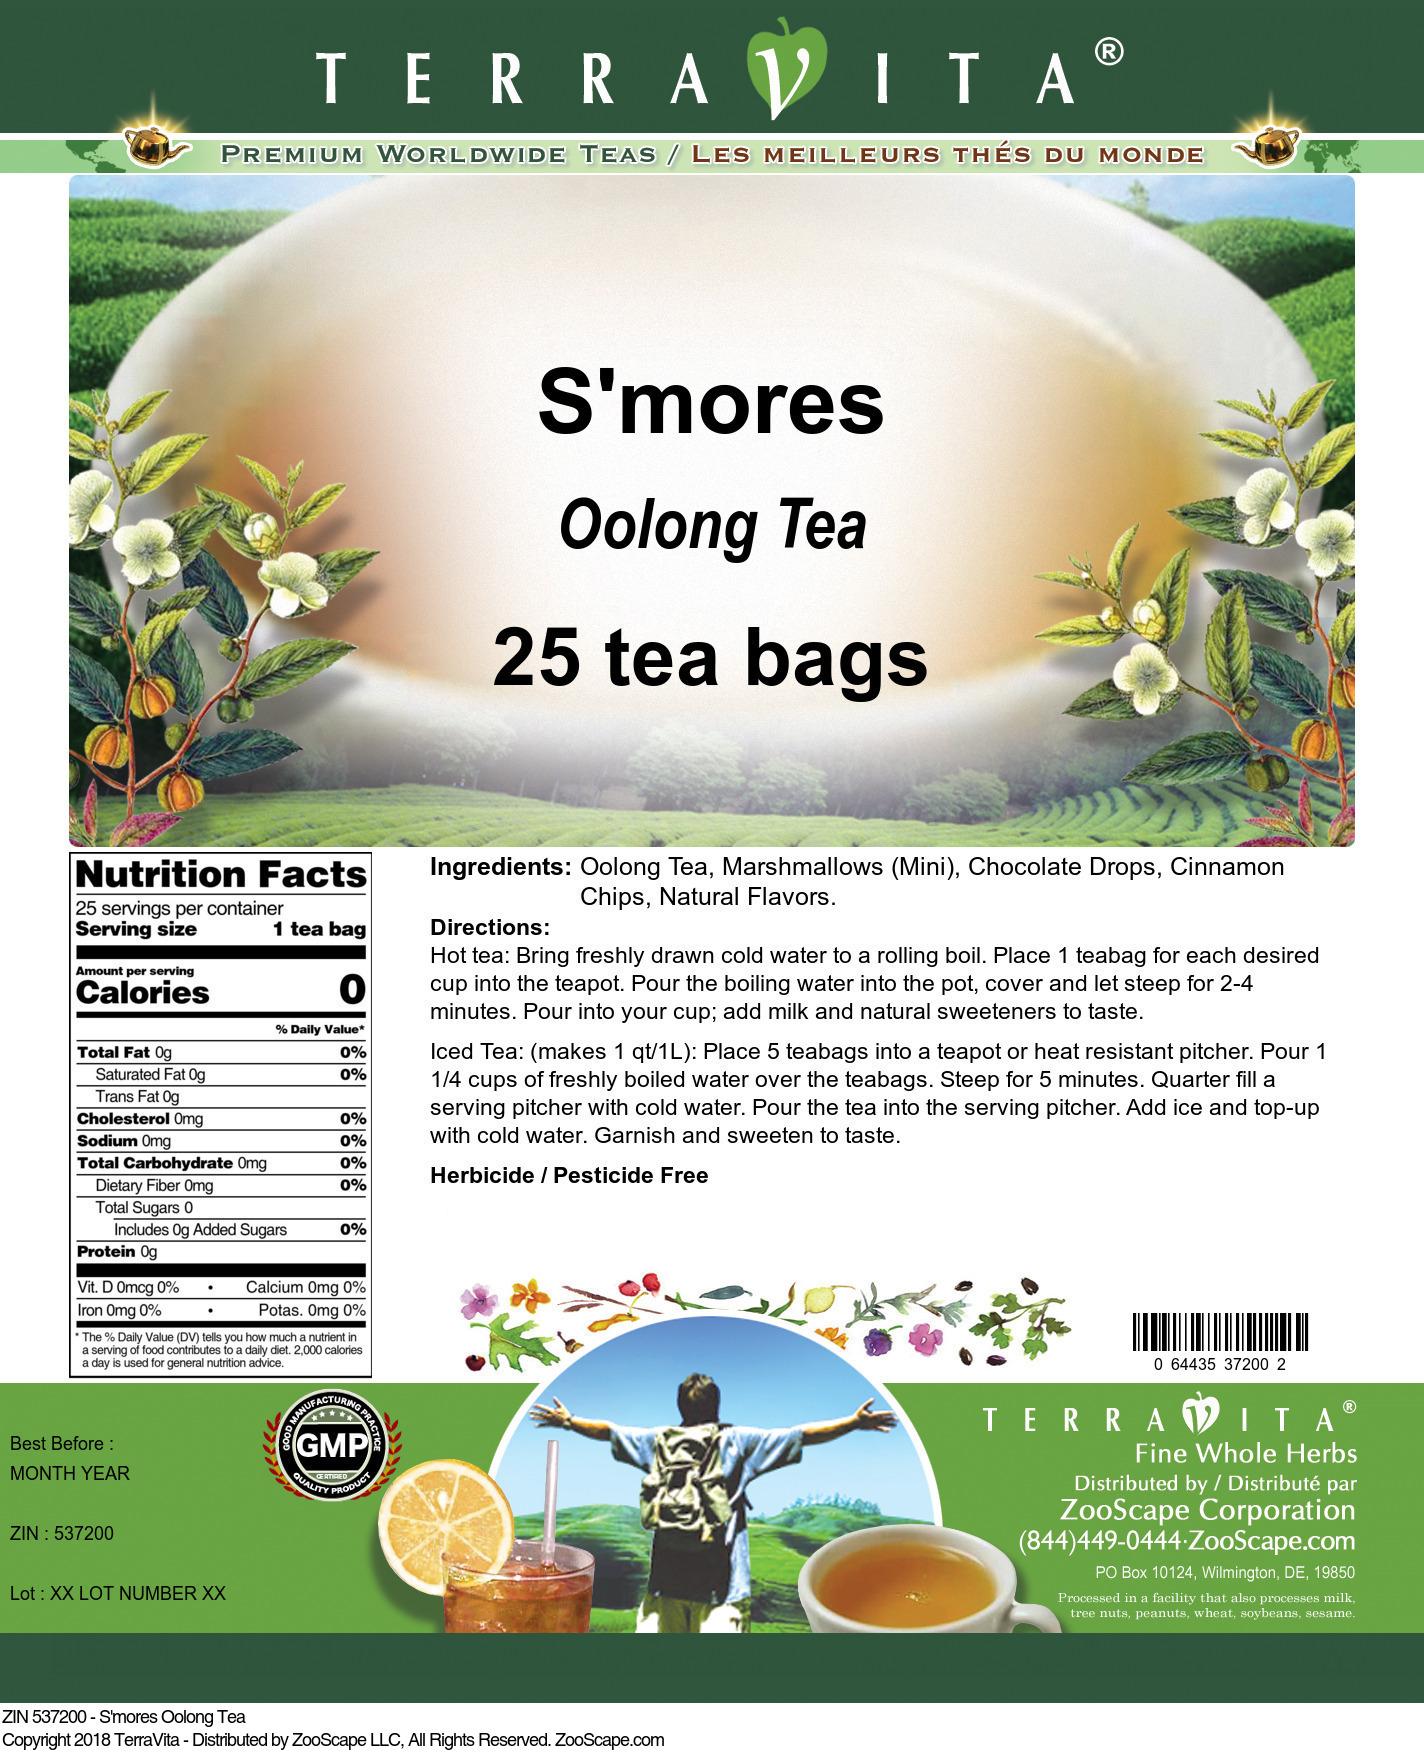 S'mores Oolong Tea